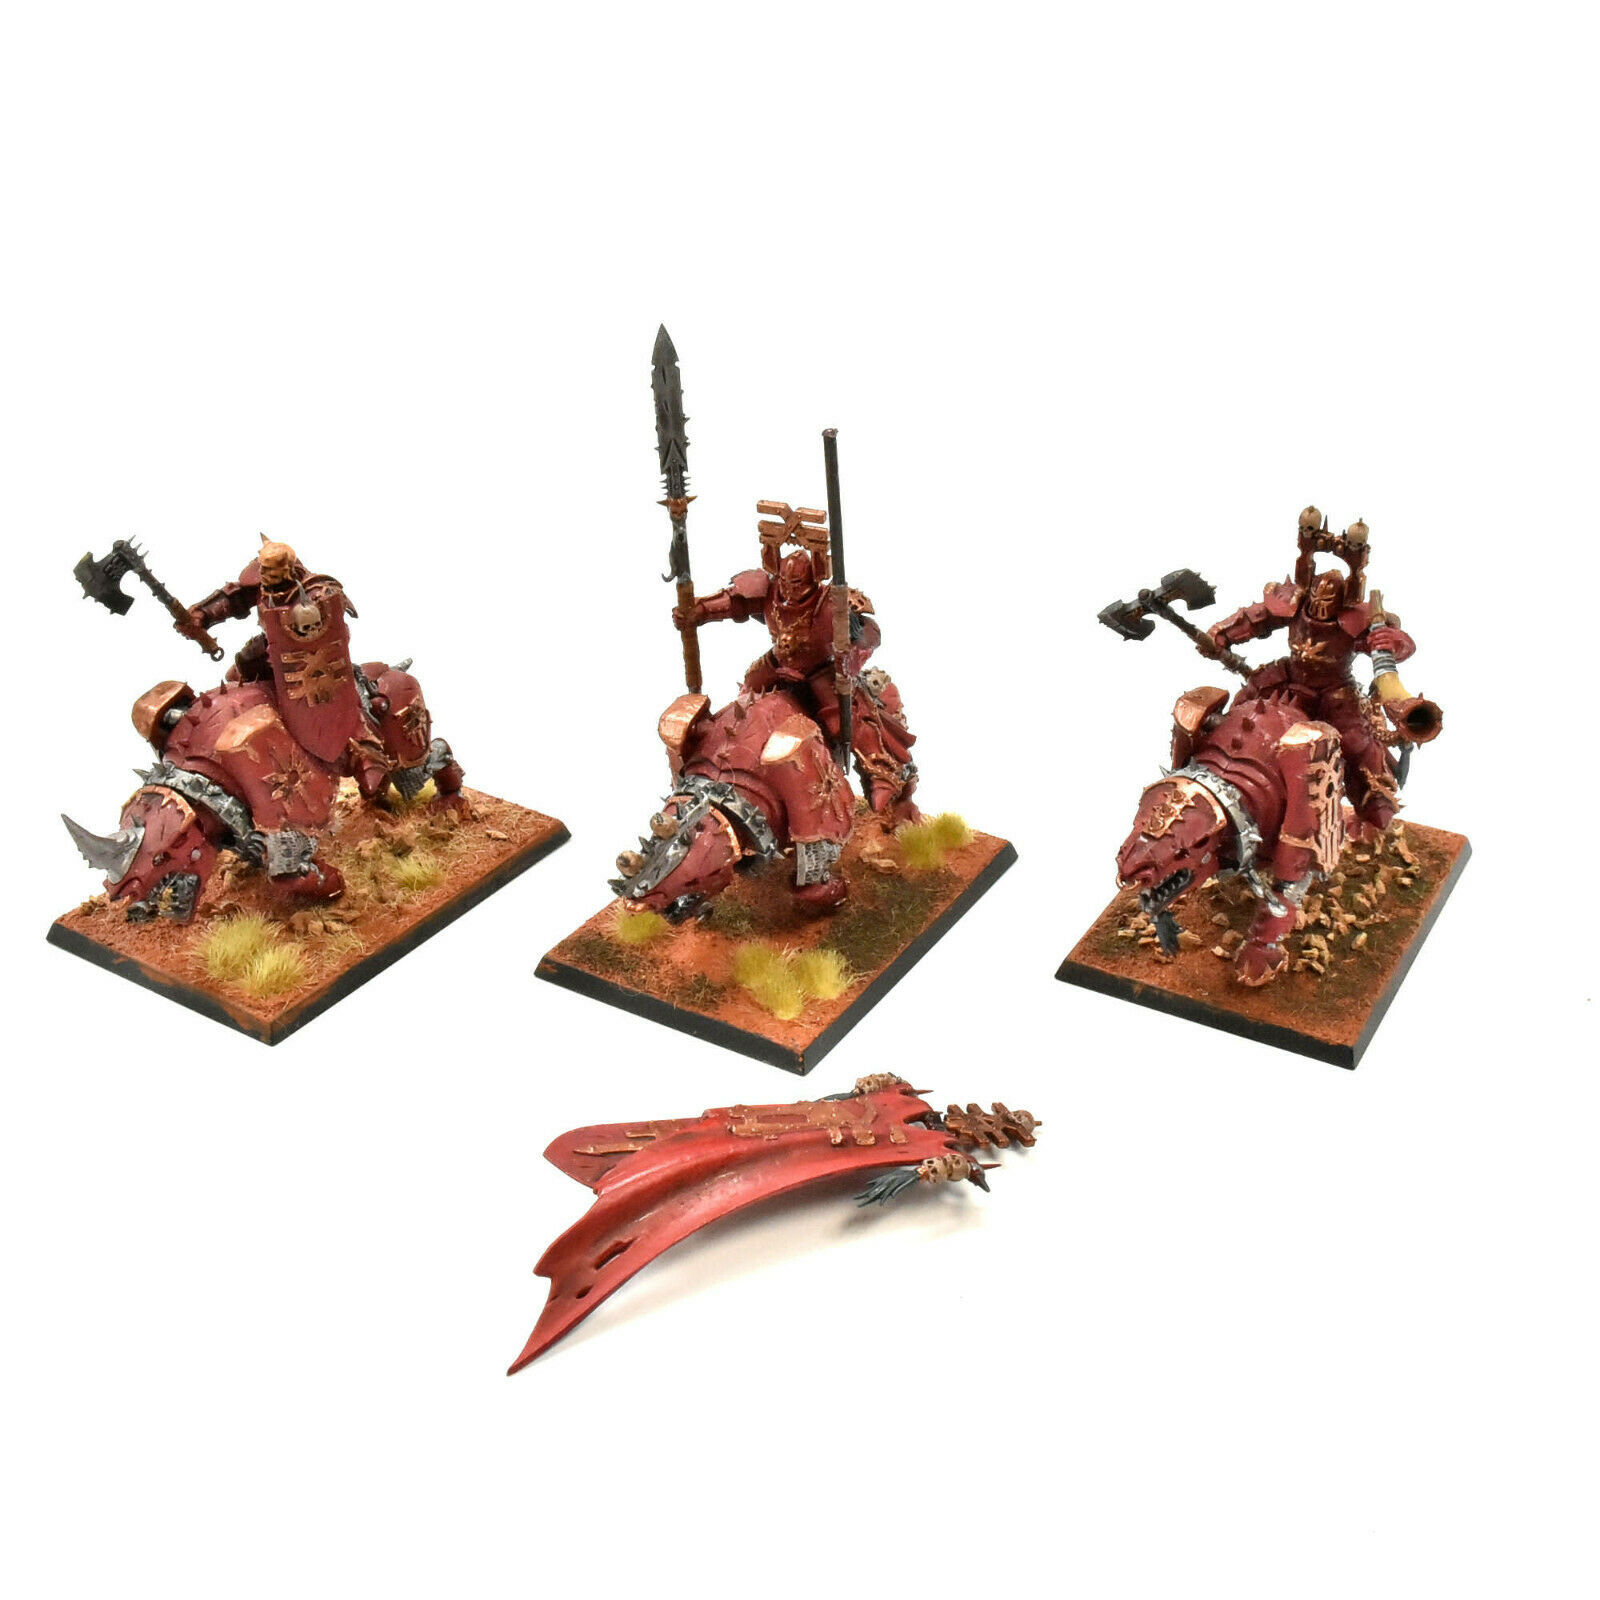 KHORNE BLOODBOUND 3 mäktiga kranskärlsskorpor\\DAR35;2 Warhammer Sigmar PAINTED